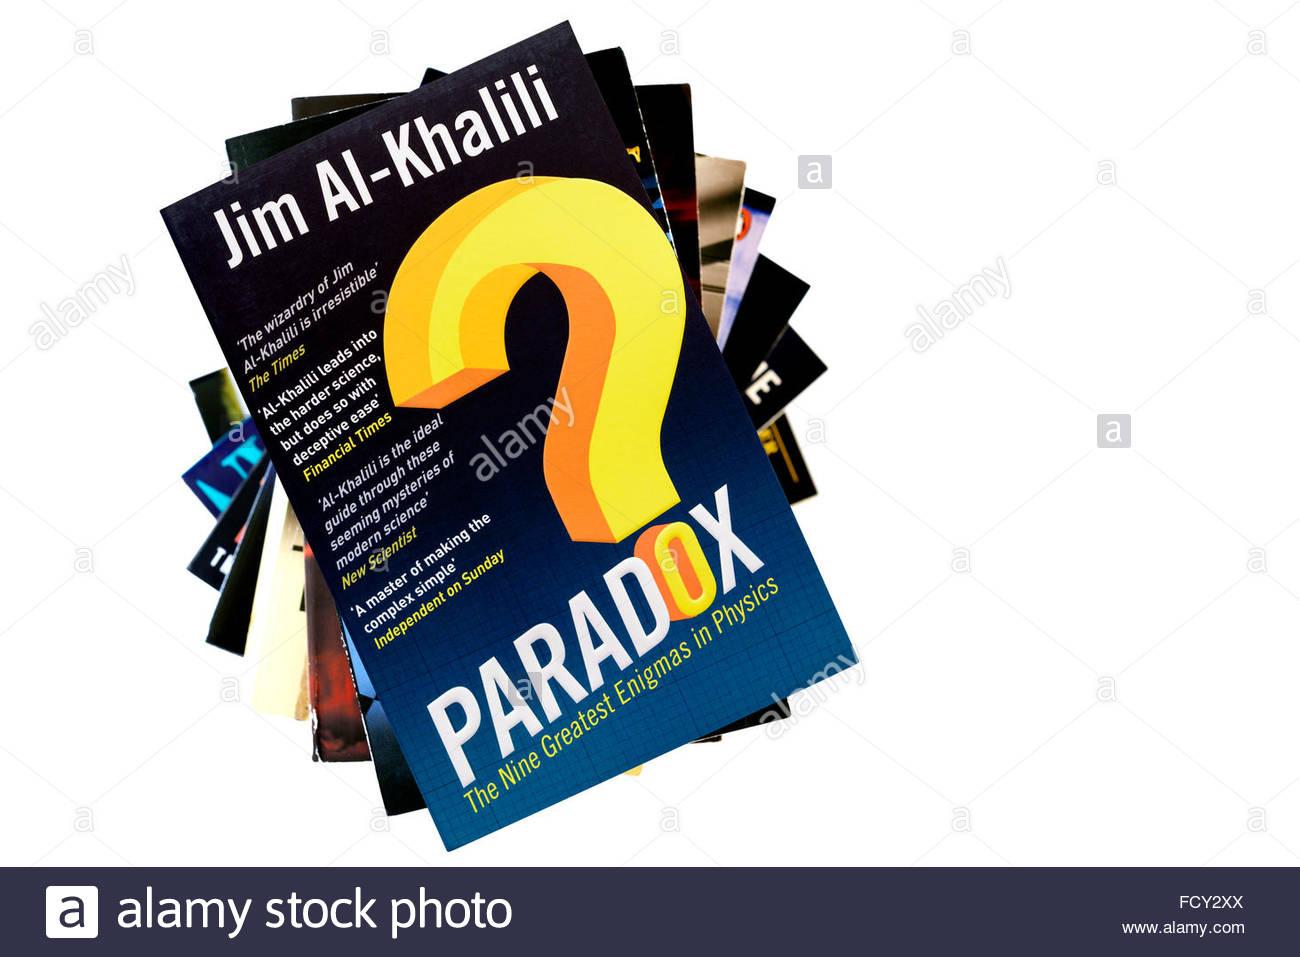 Jim Al-Khalili 2012 book Paradox: The Nine Greatest Enigmas, stacked used books, England - Stock Image